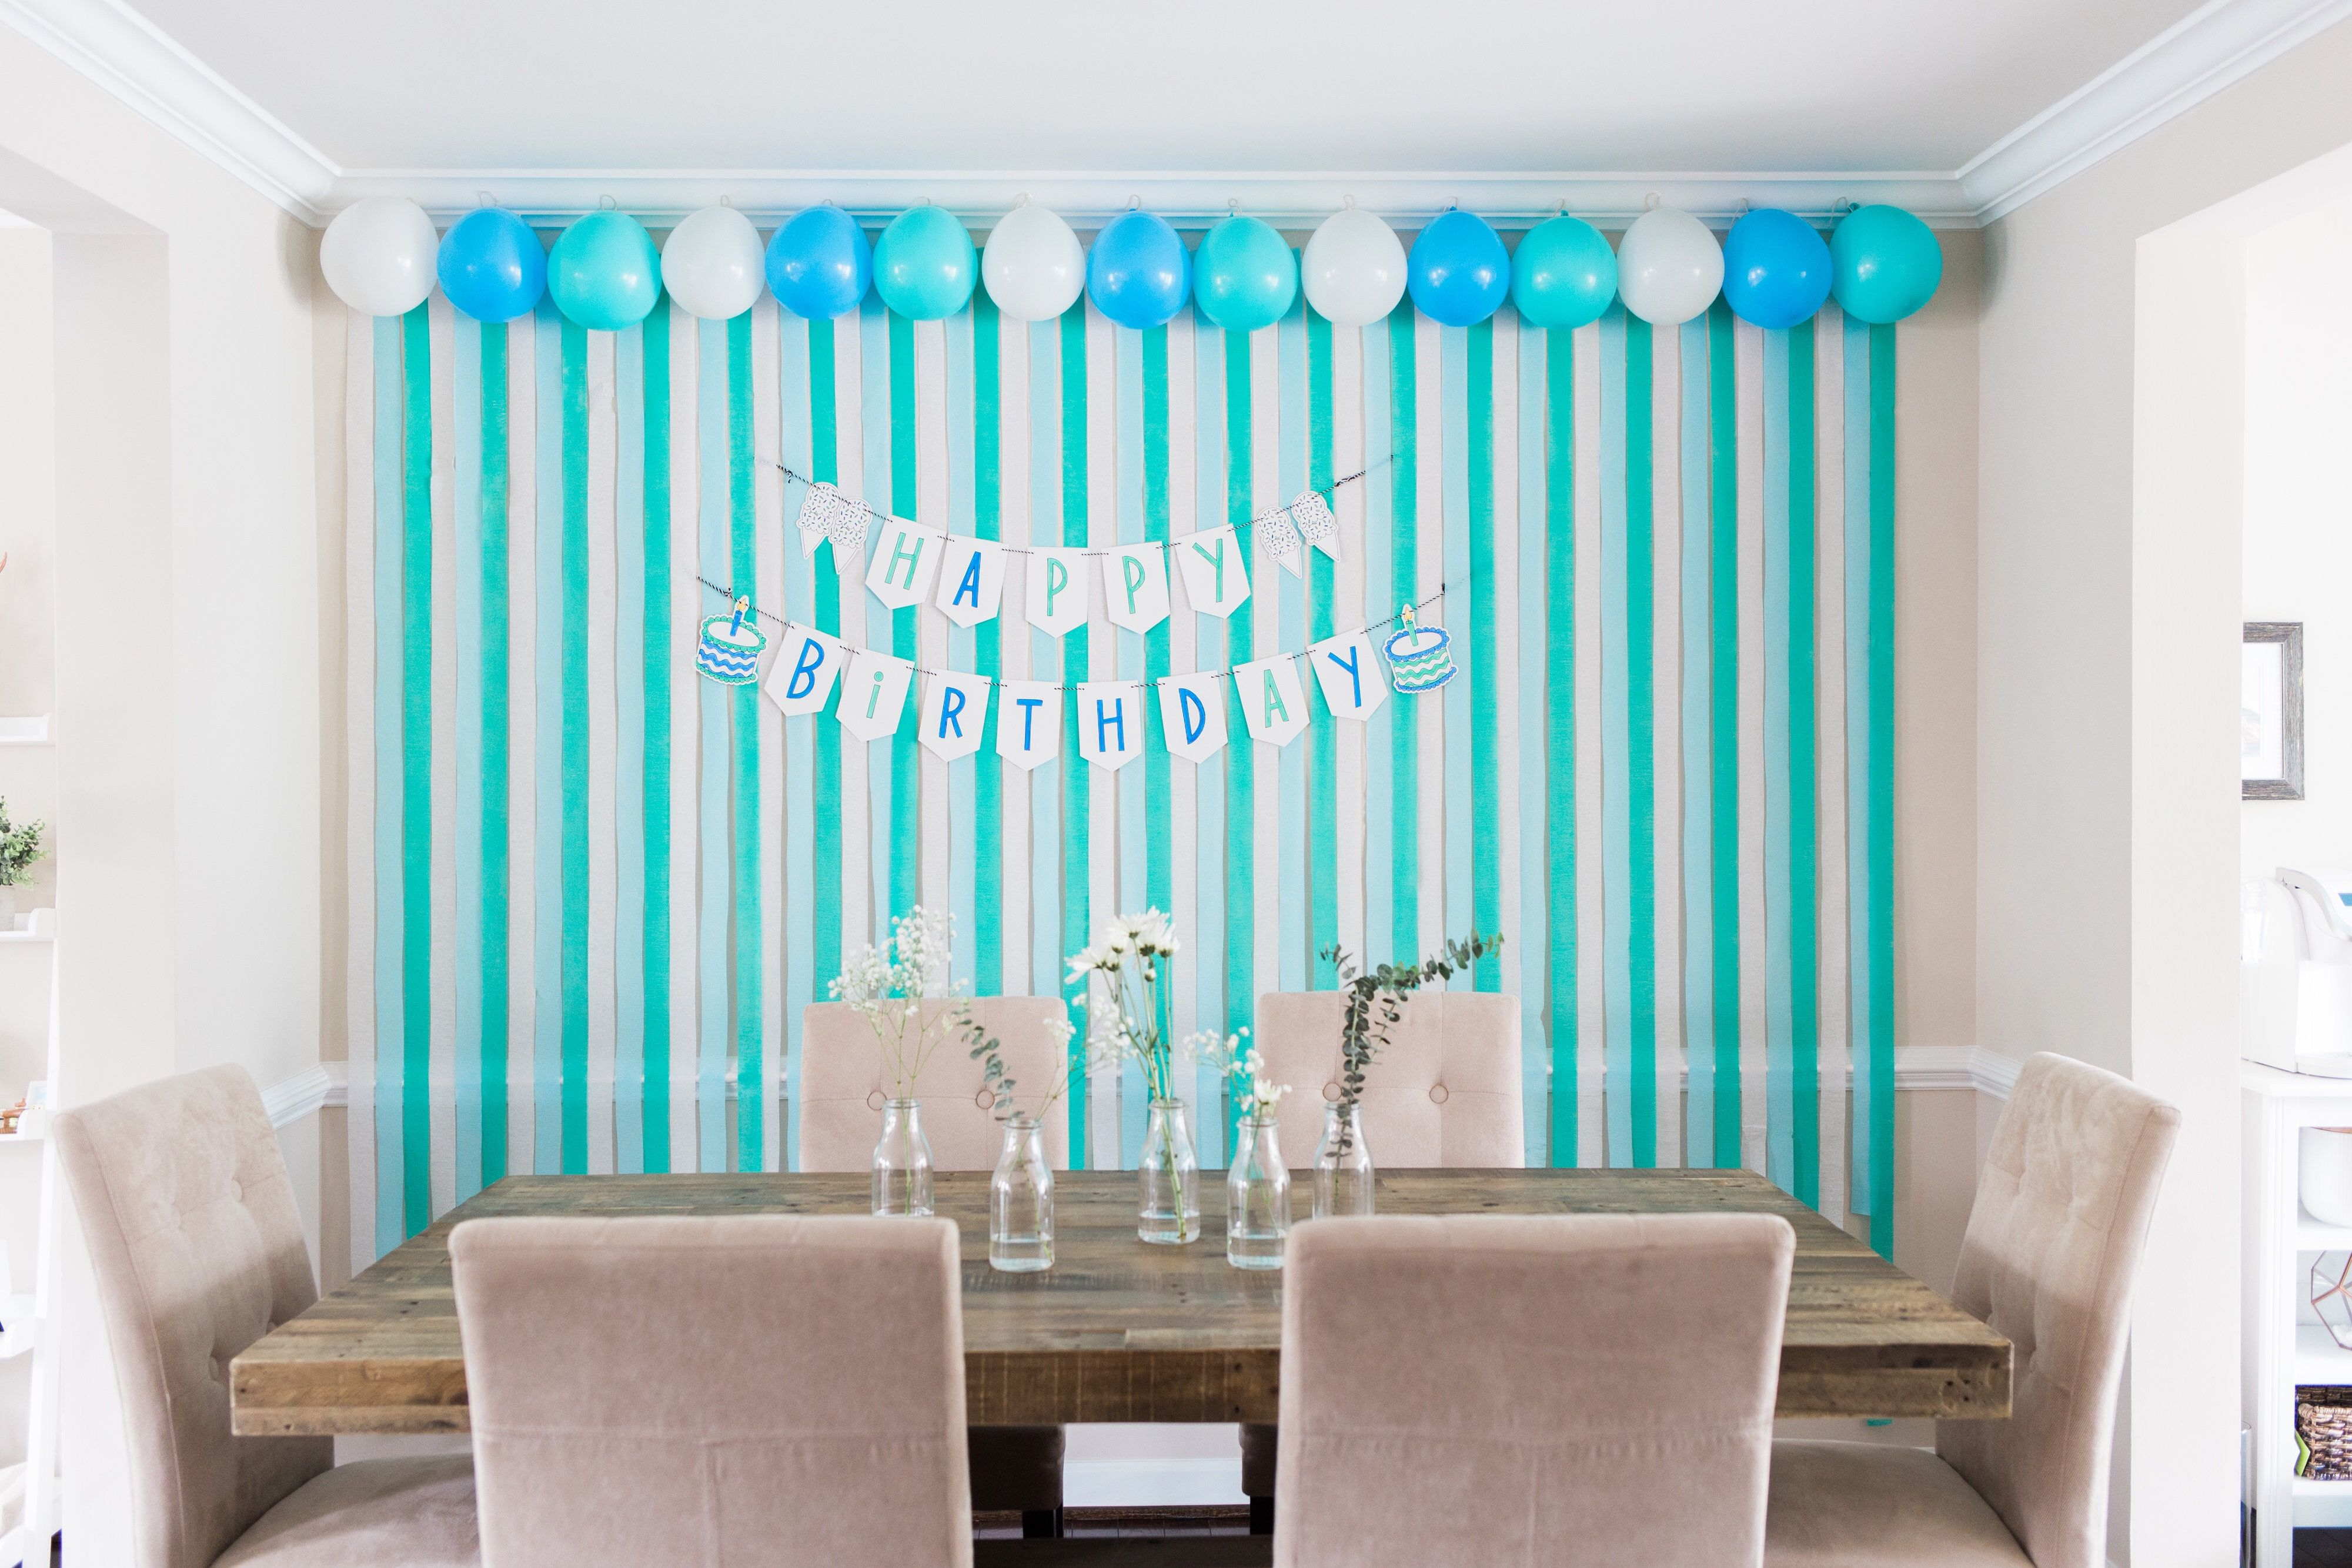 Diy Birthday Backdrop Using Balloons And Streamers Diy Backdrop